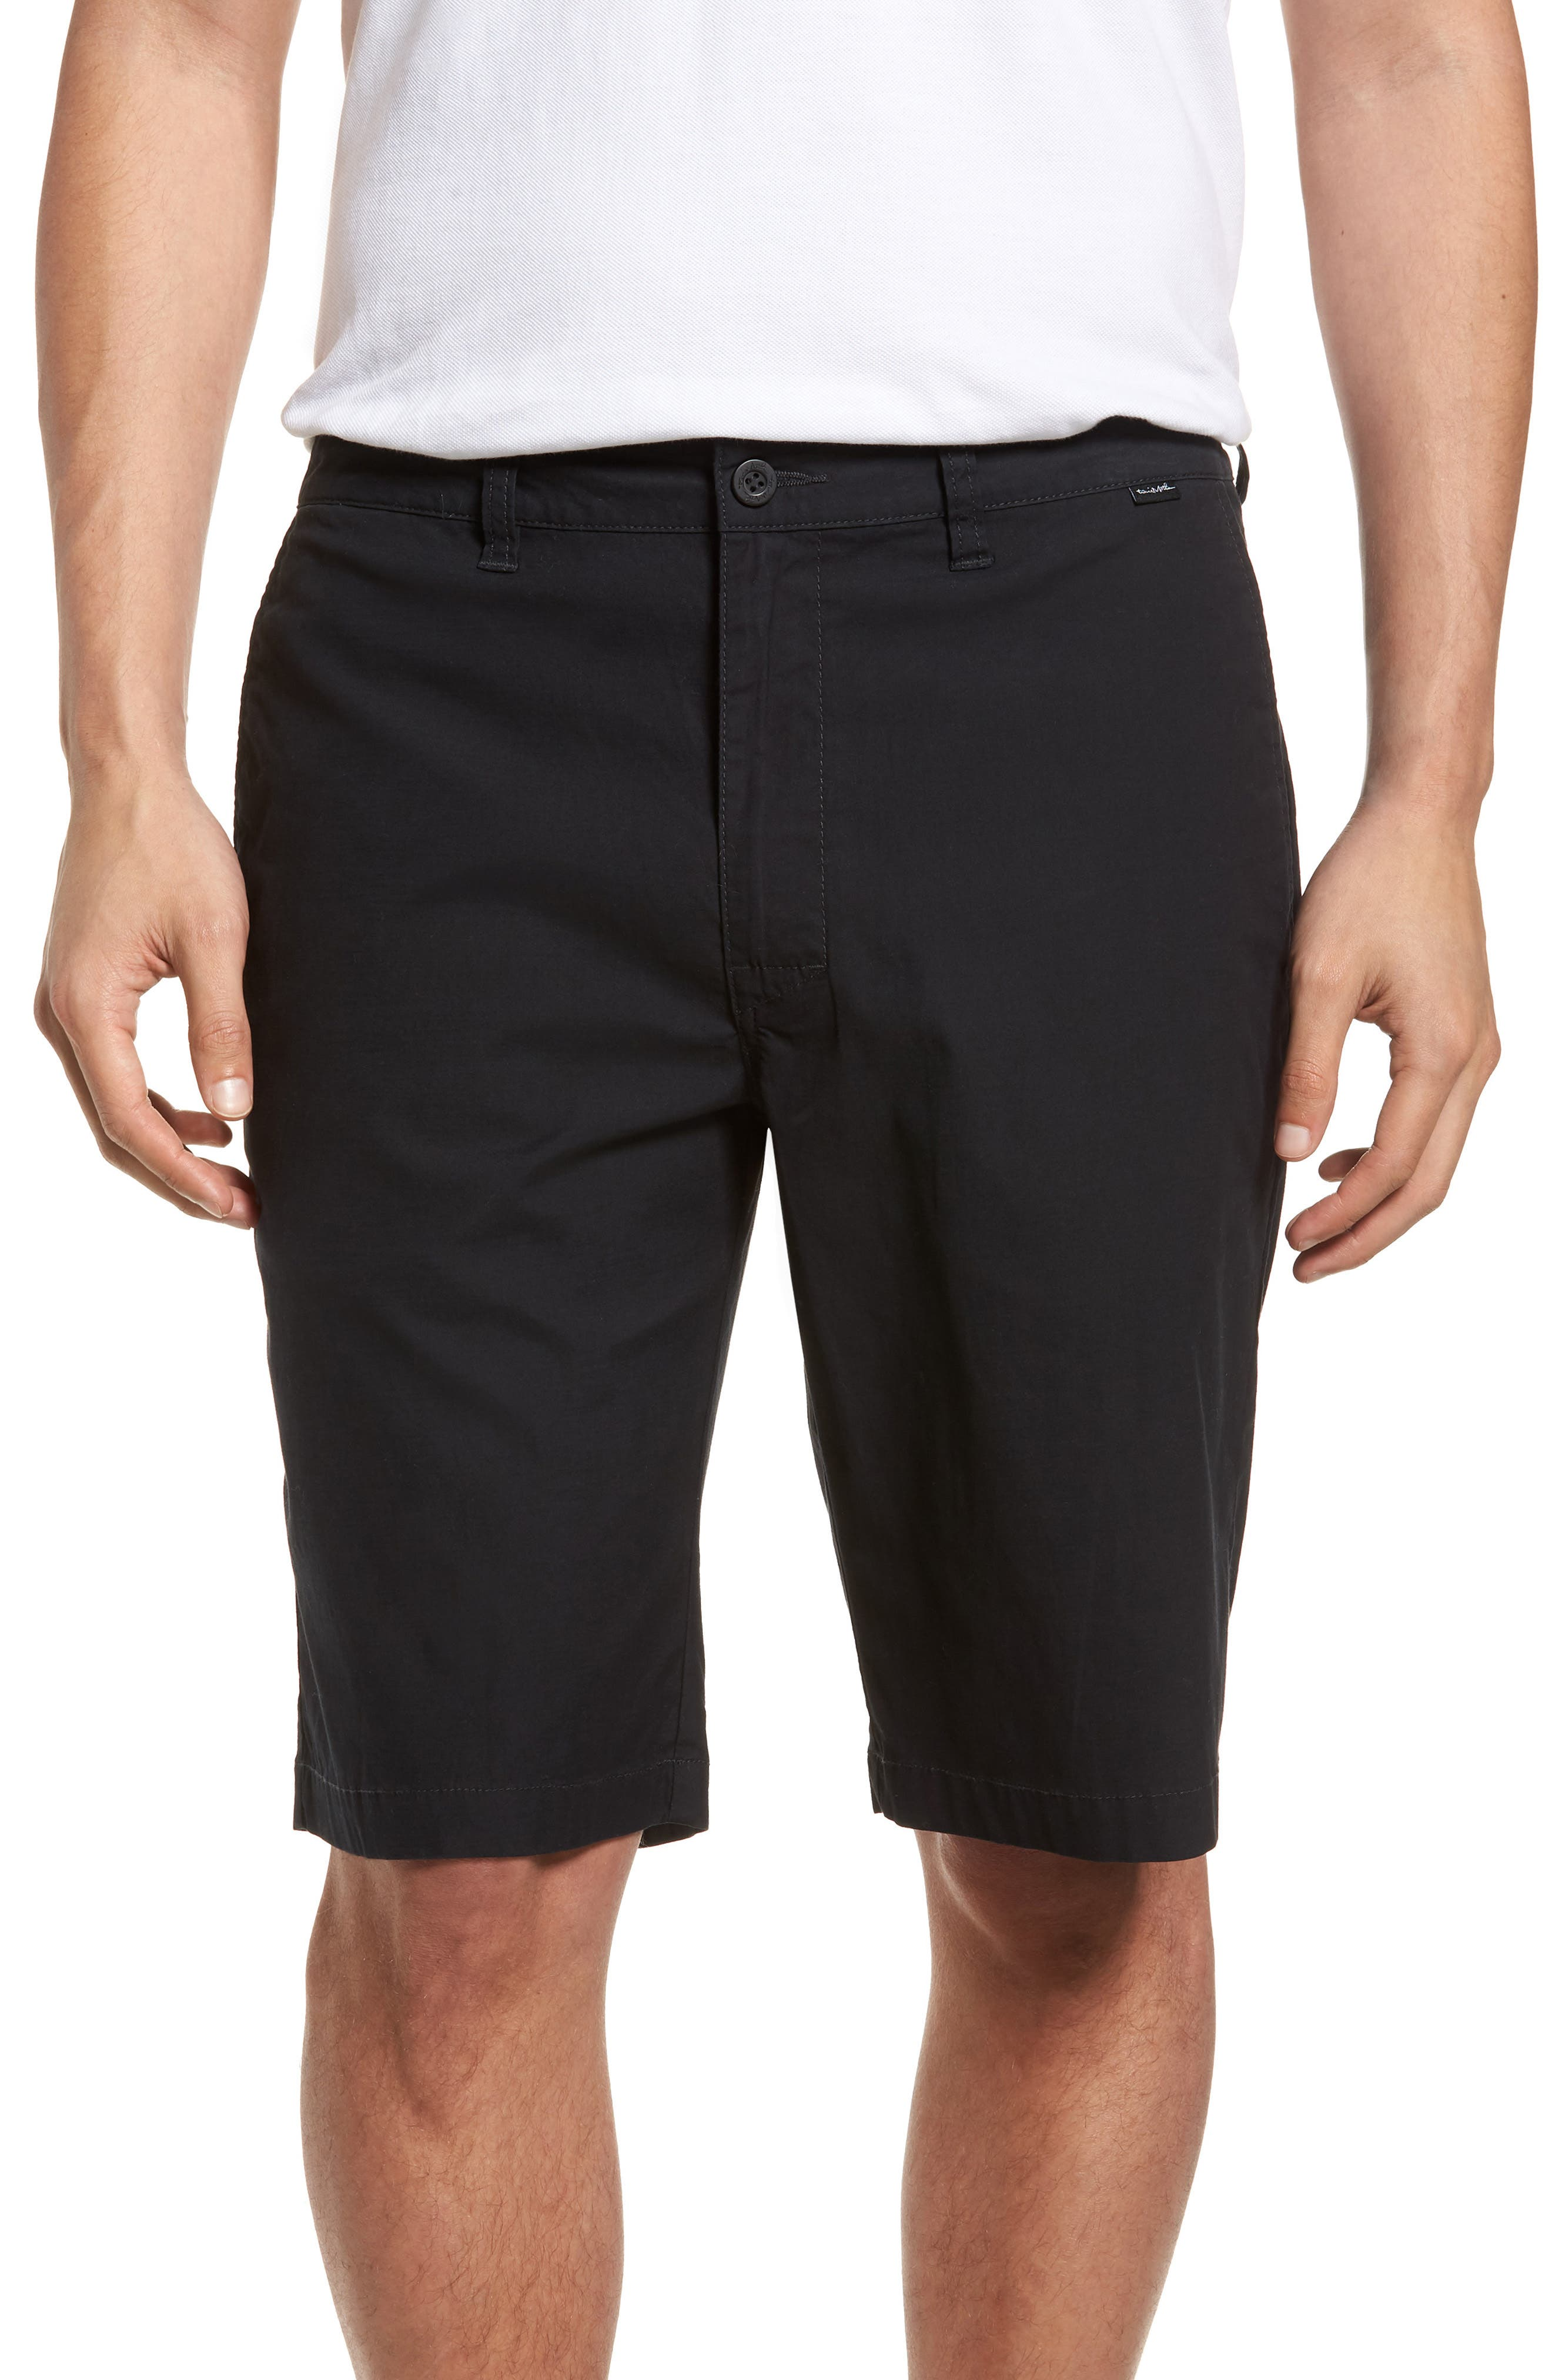 Huntington Shorts,                             Main thumbnail 1, color,                             BLACK